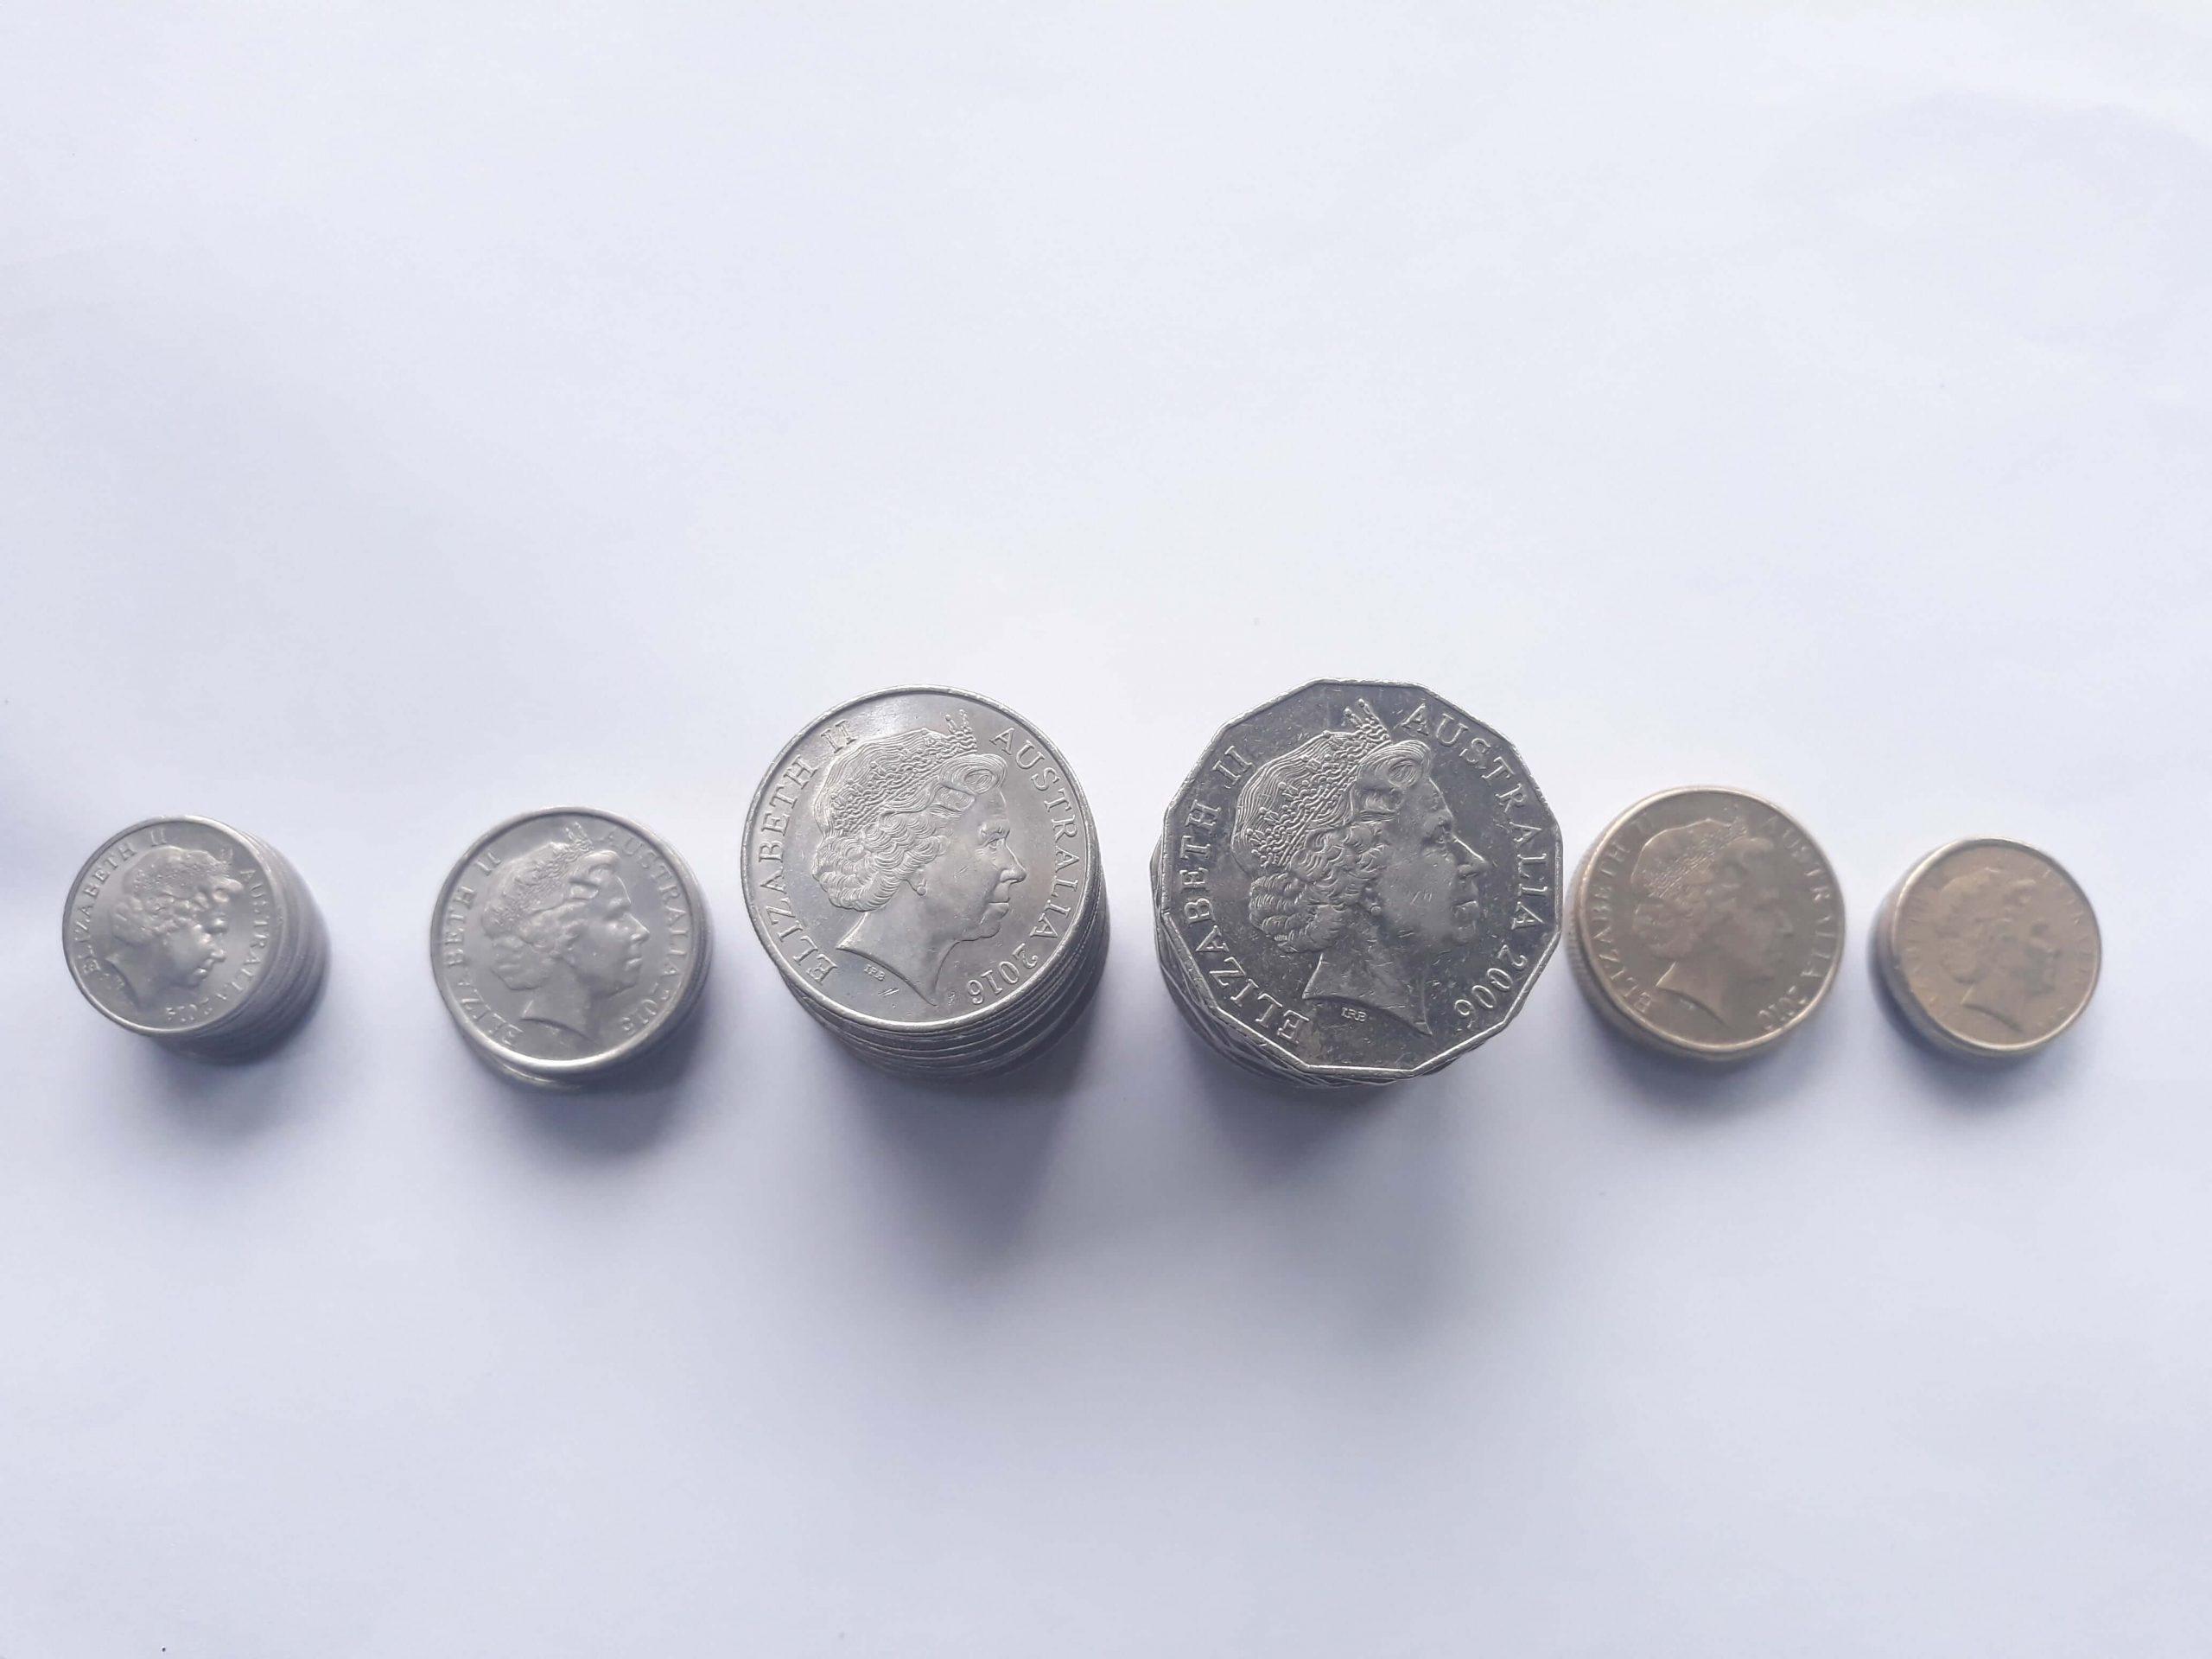 Horizontal row of Australian coins on a grey tabletop